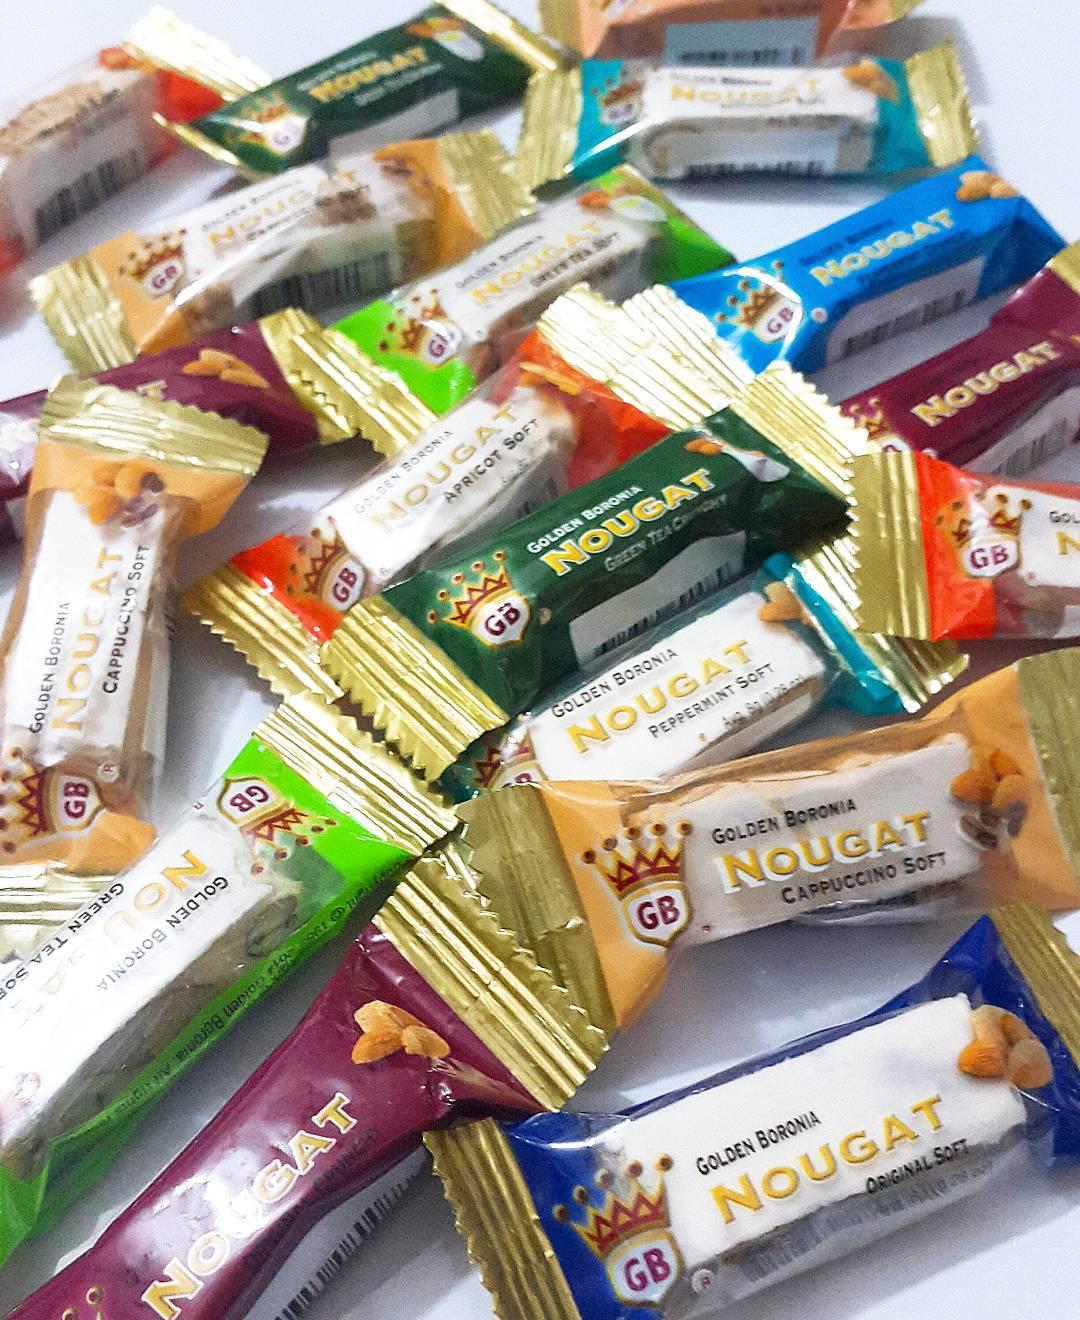 Australian nougat - foodpanda 11.11 sale